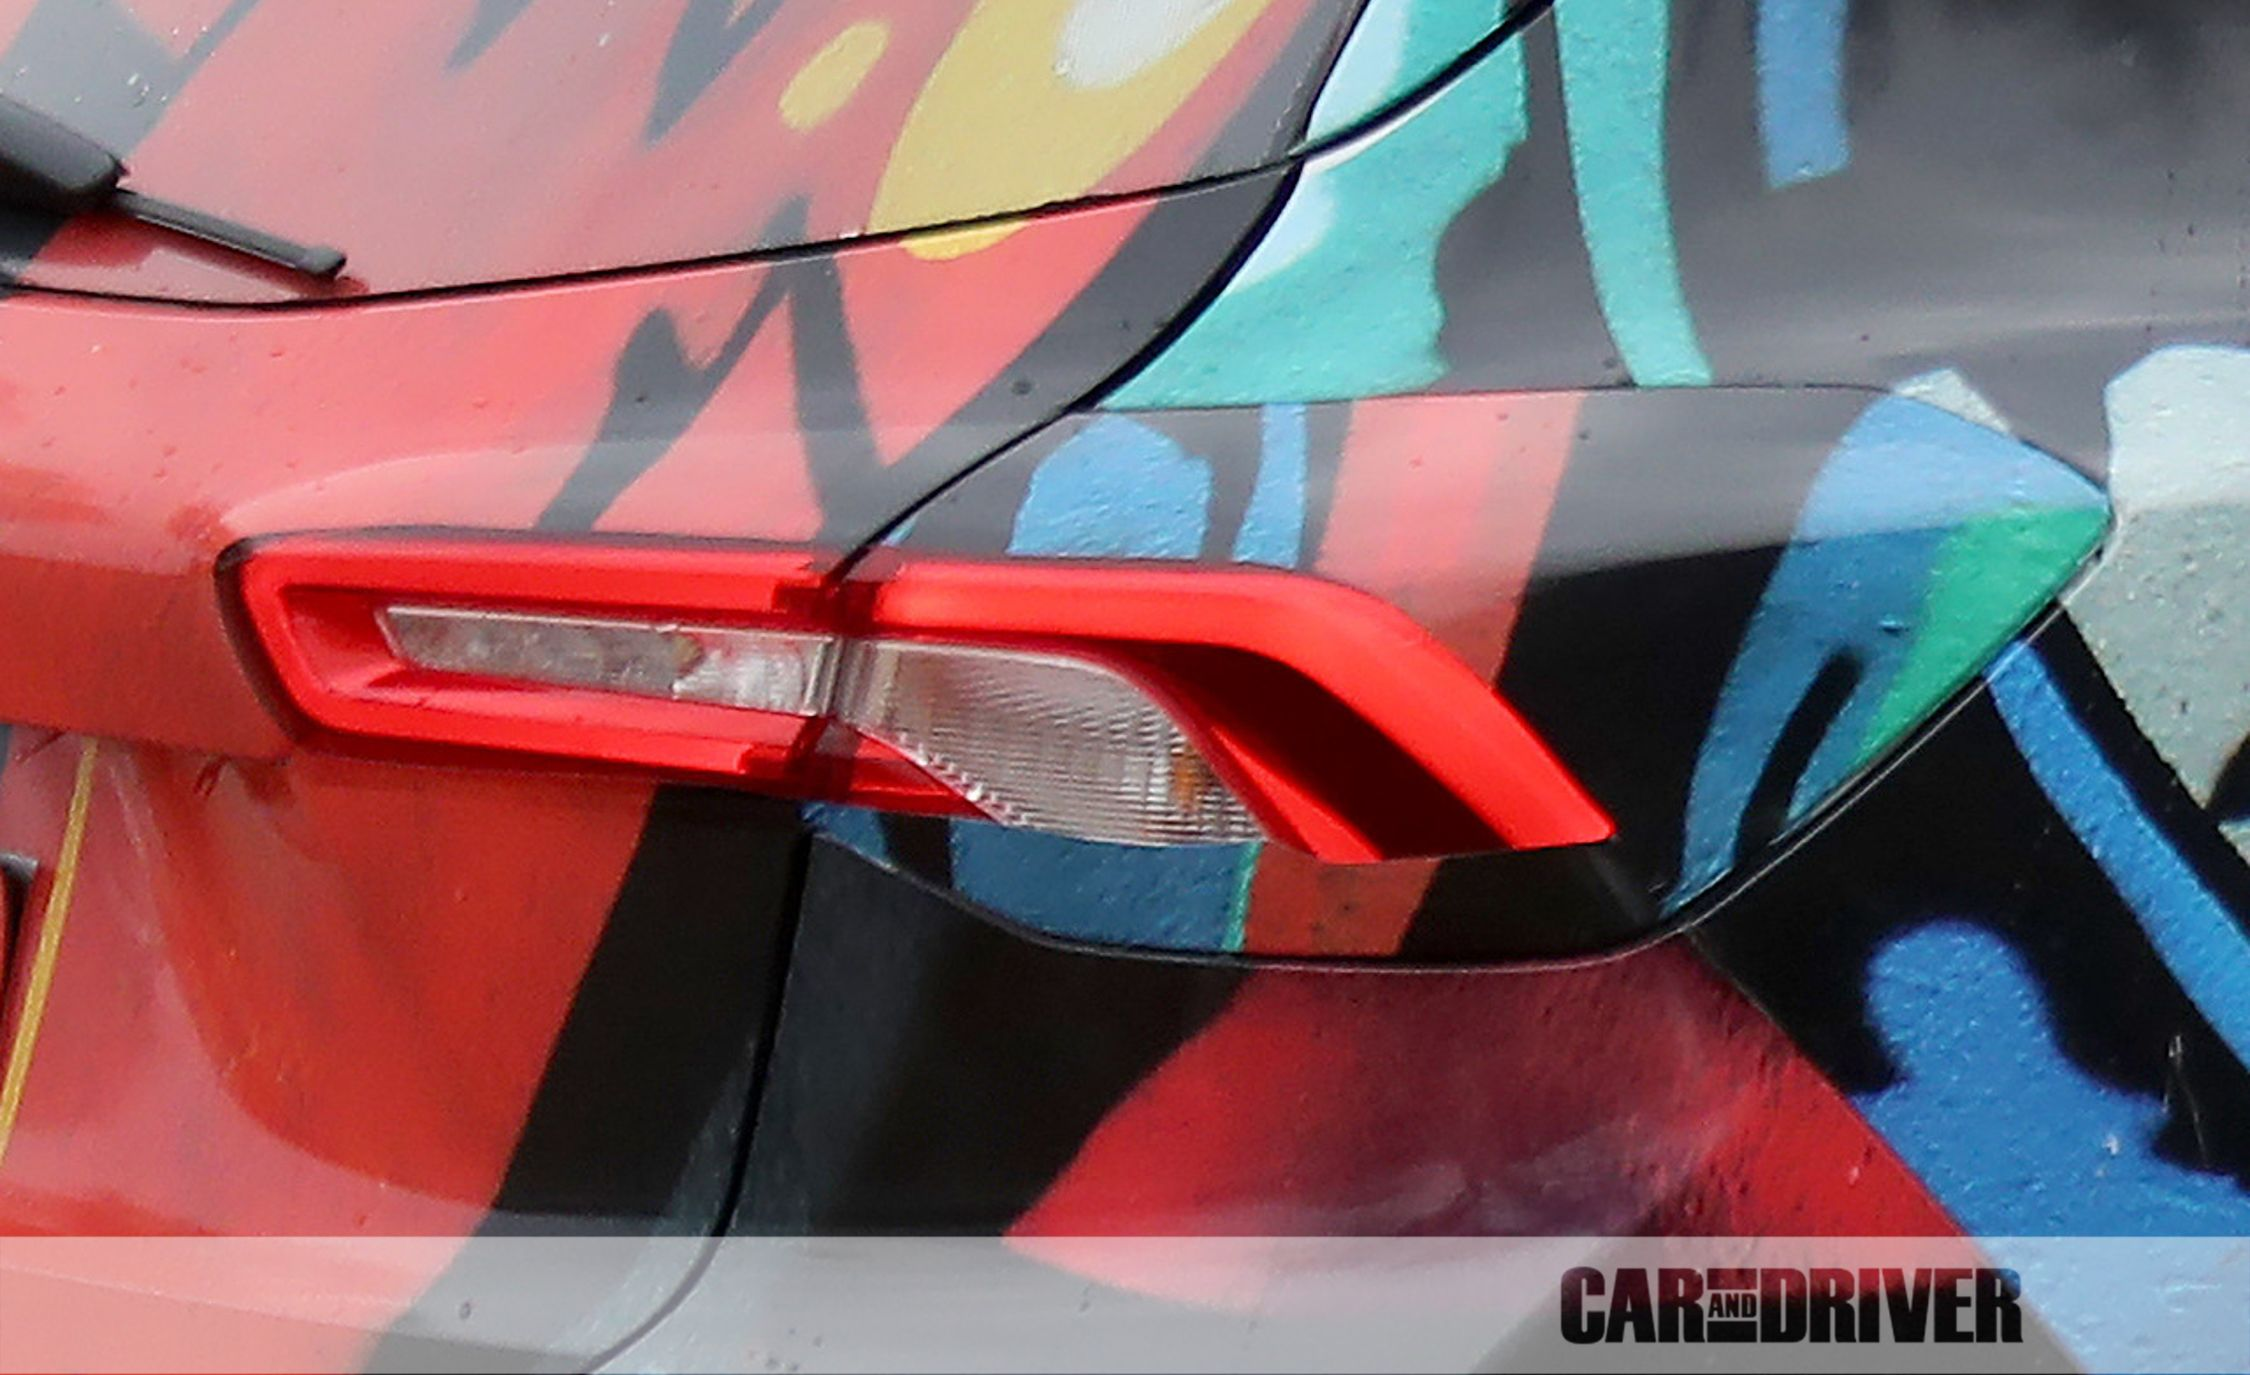 2019 Ford Focus hatchback (spy photo) Photo Gallery